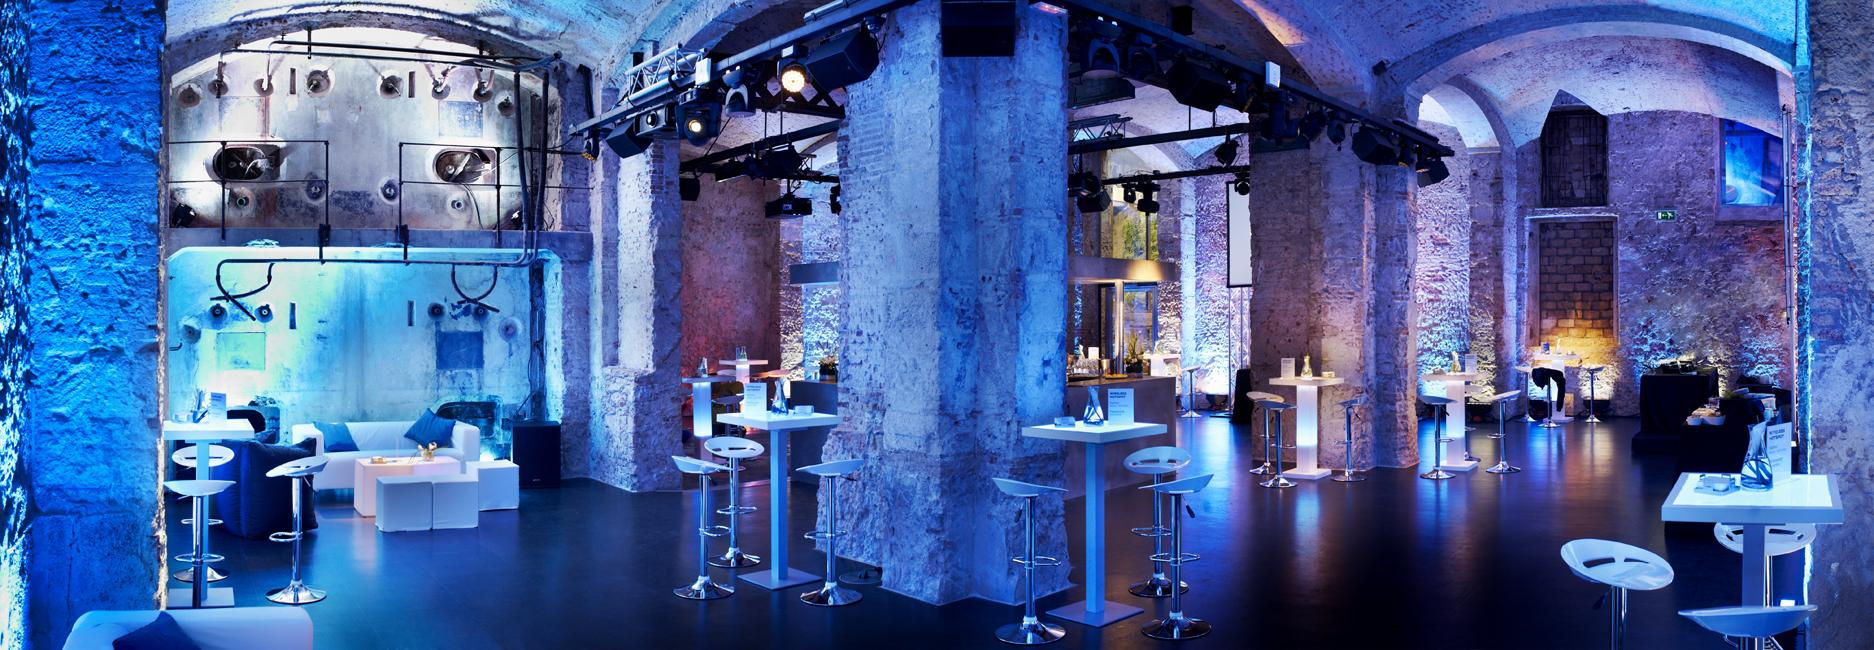 01_cocktail sala 39.jpg